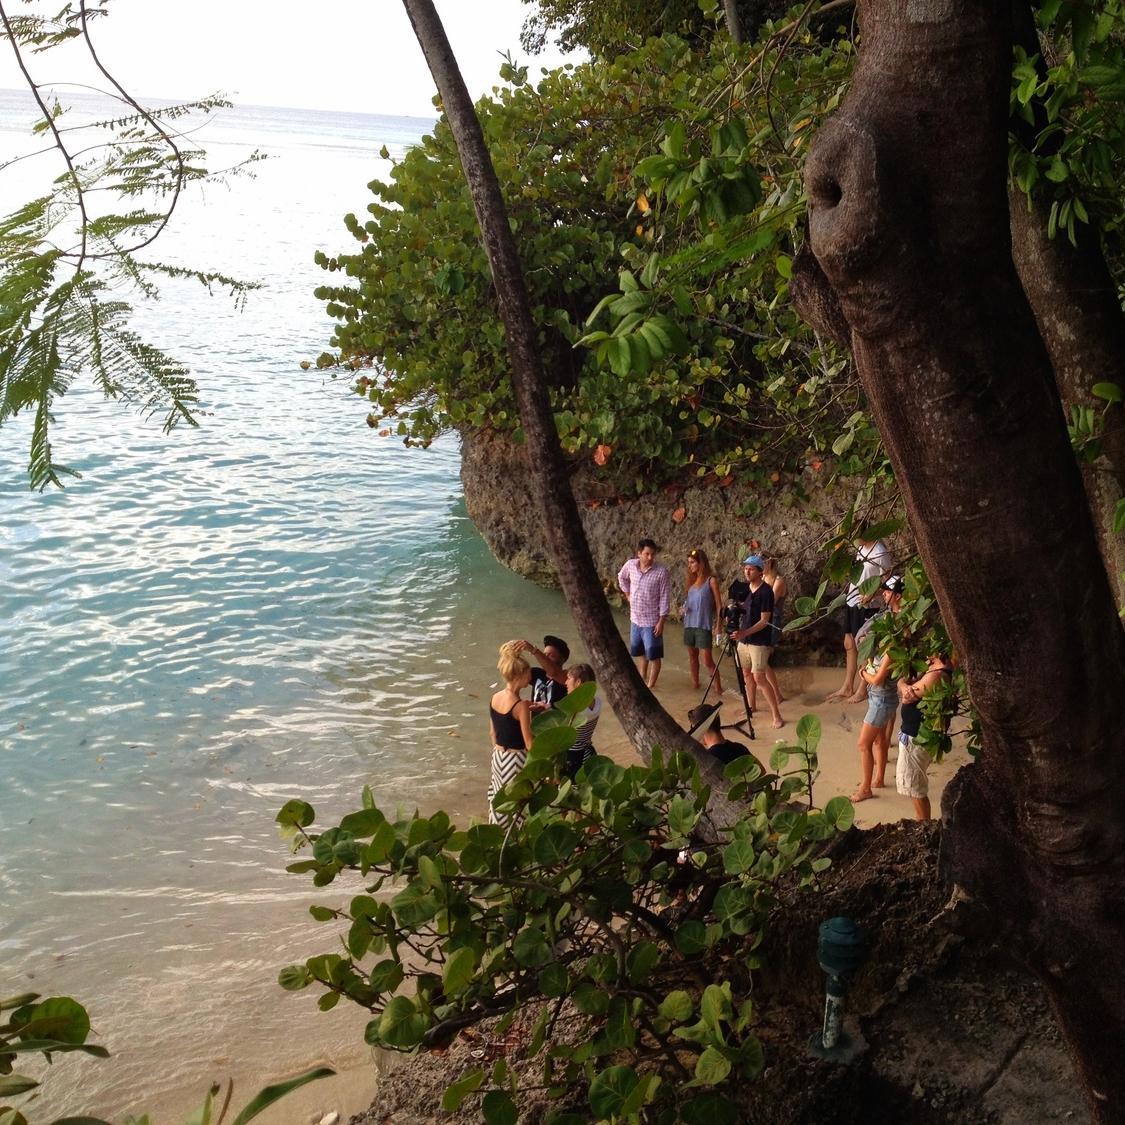 Calypso St Barth on location in Barbados